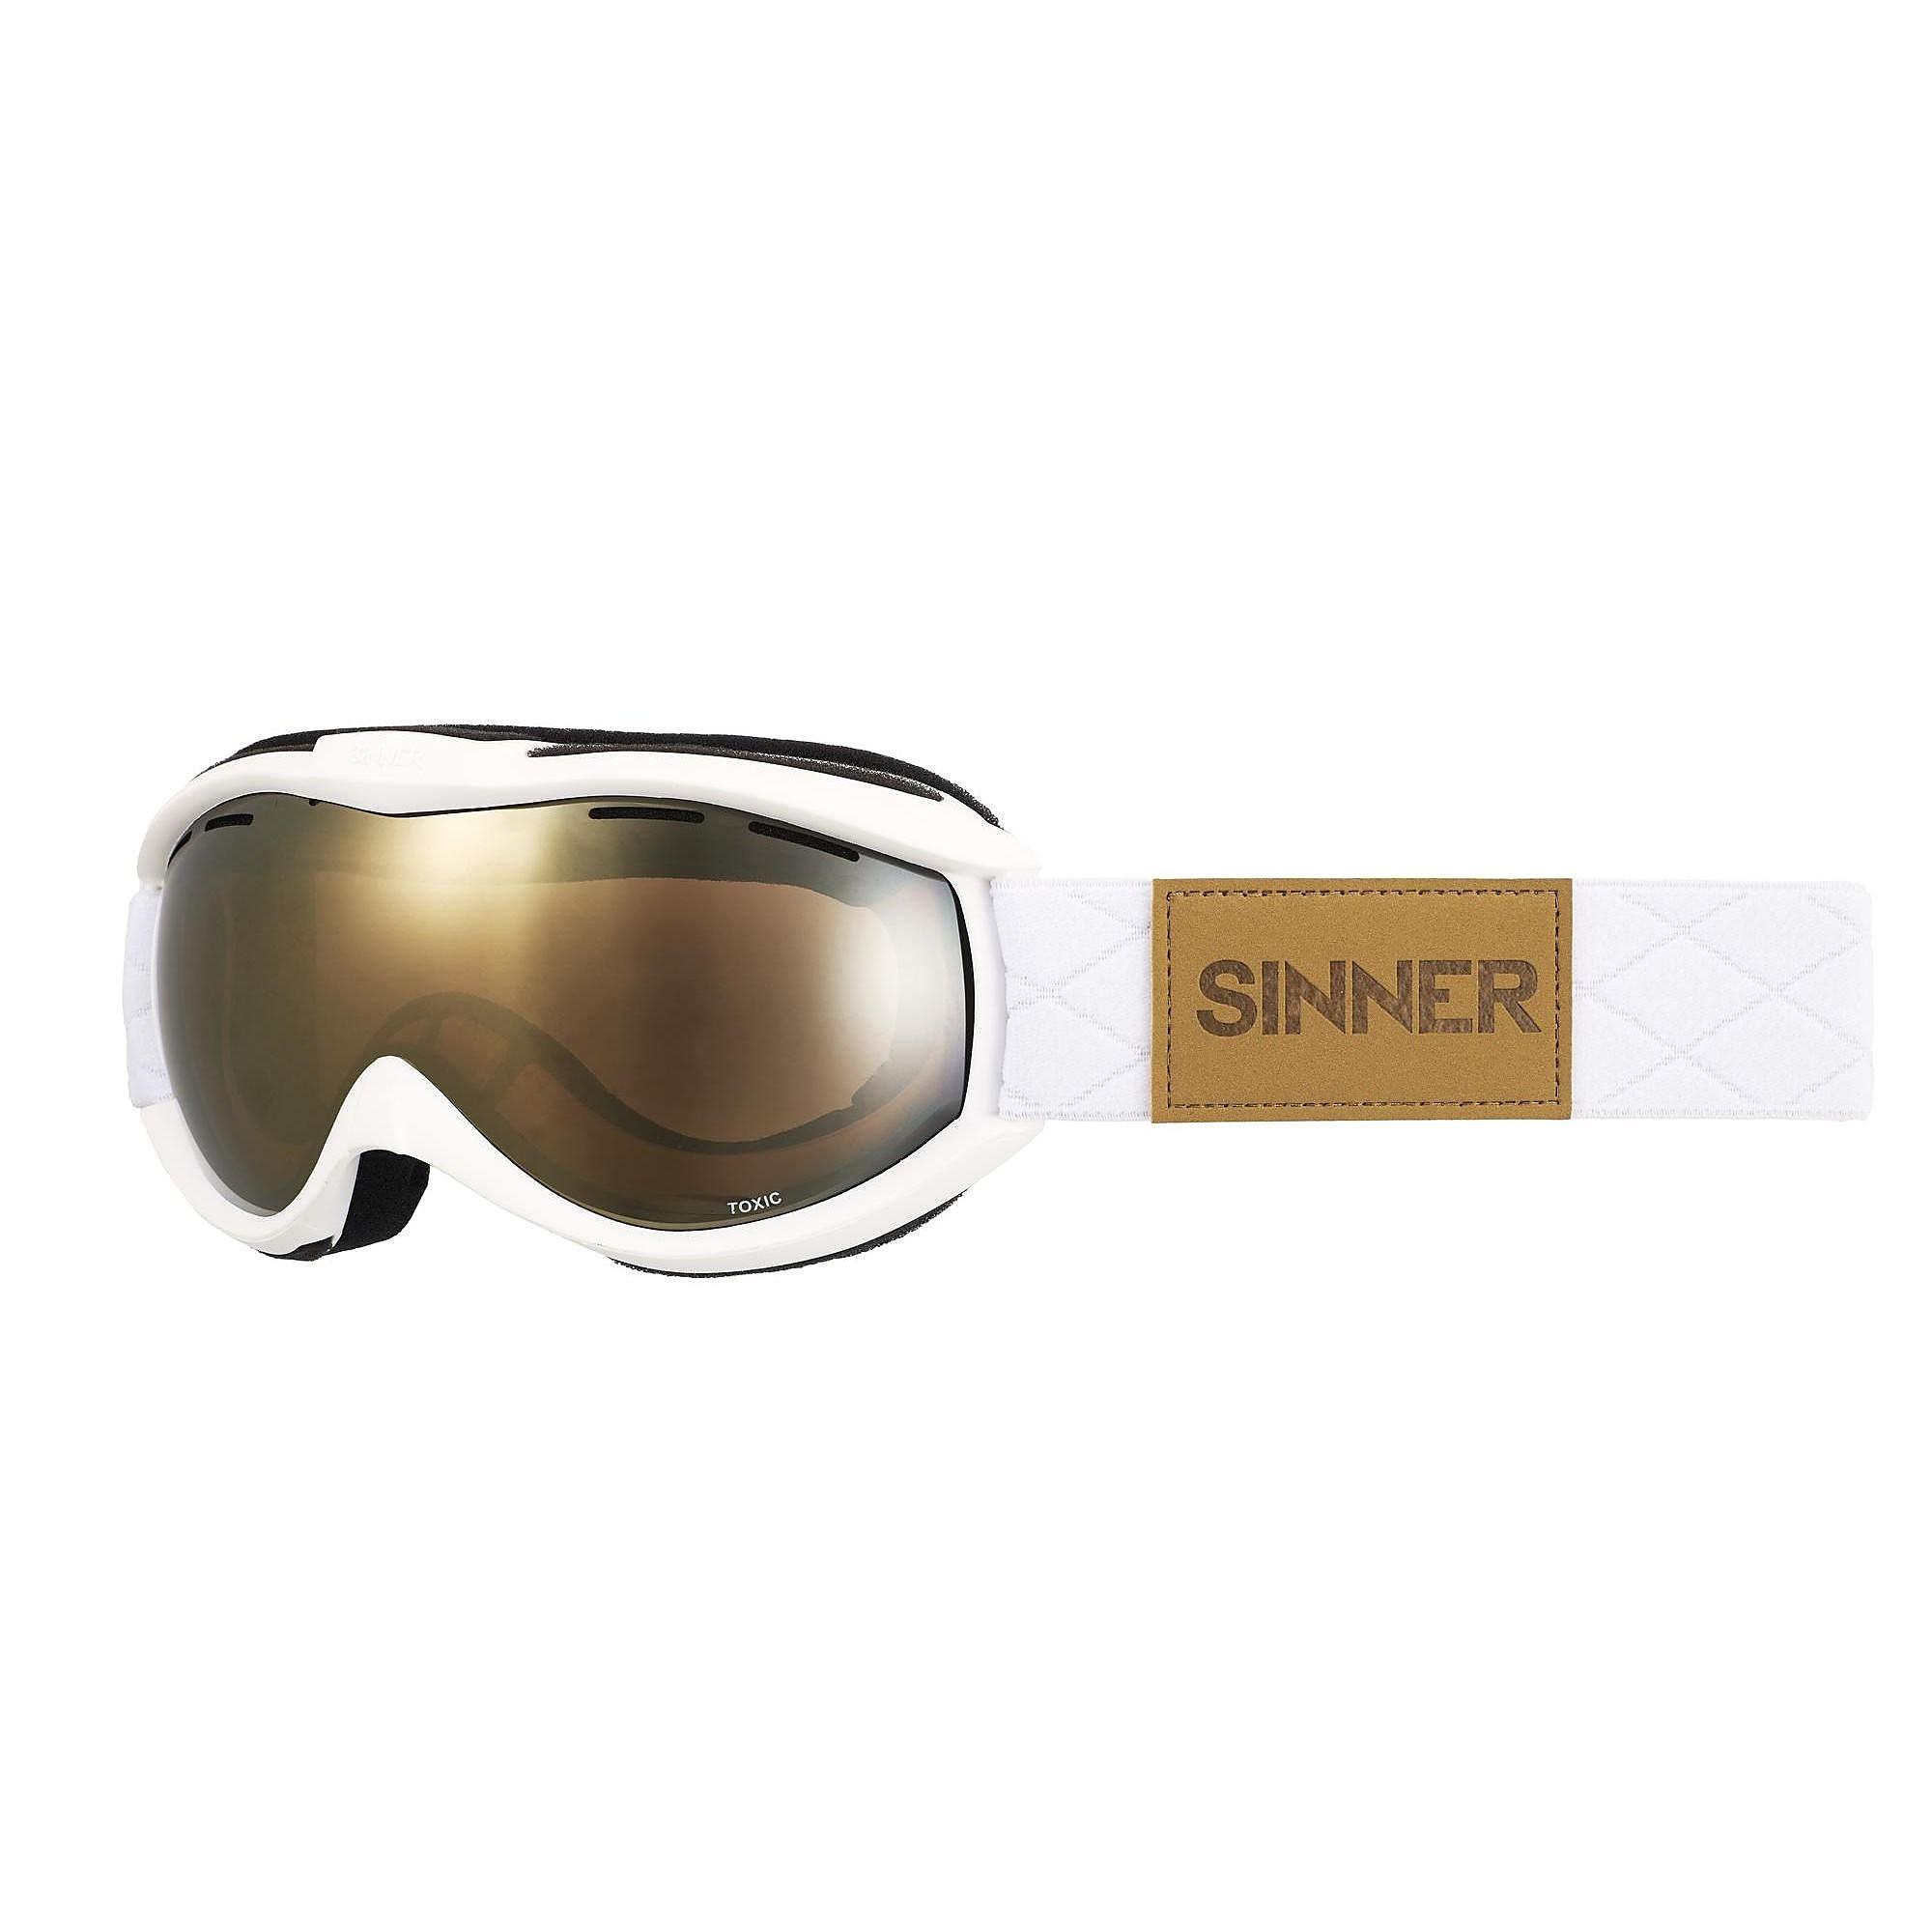 SINNER TOXIC SKIBRIL WIT/GOUD